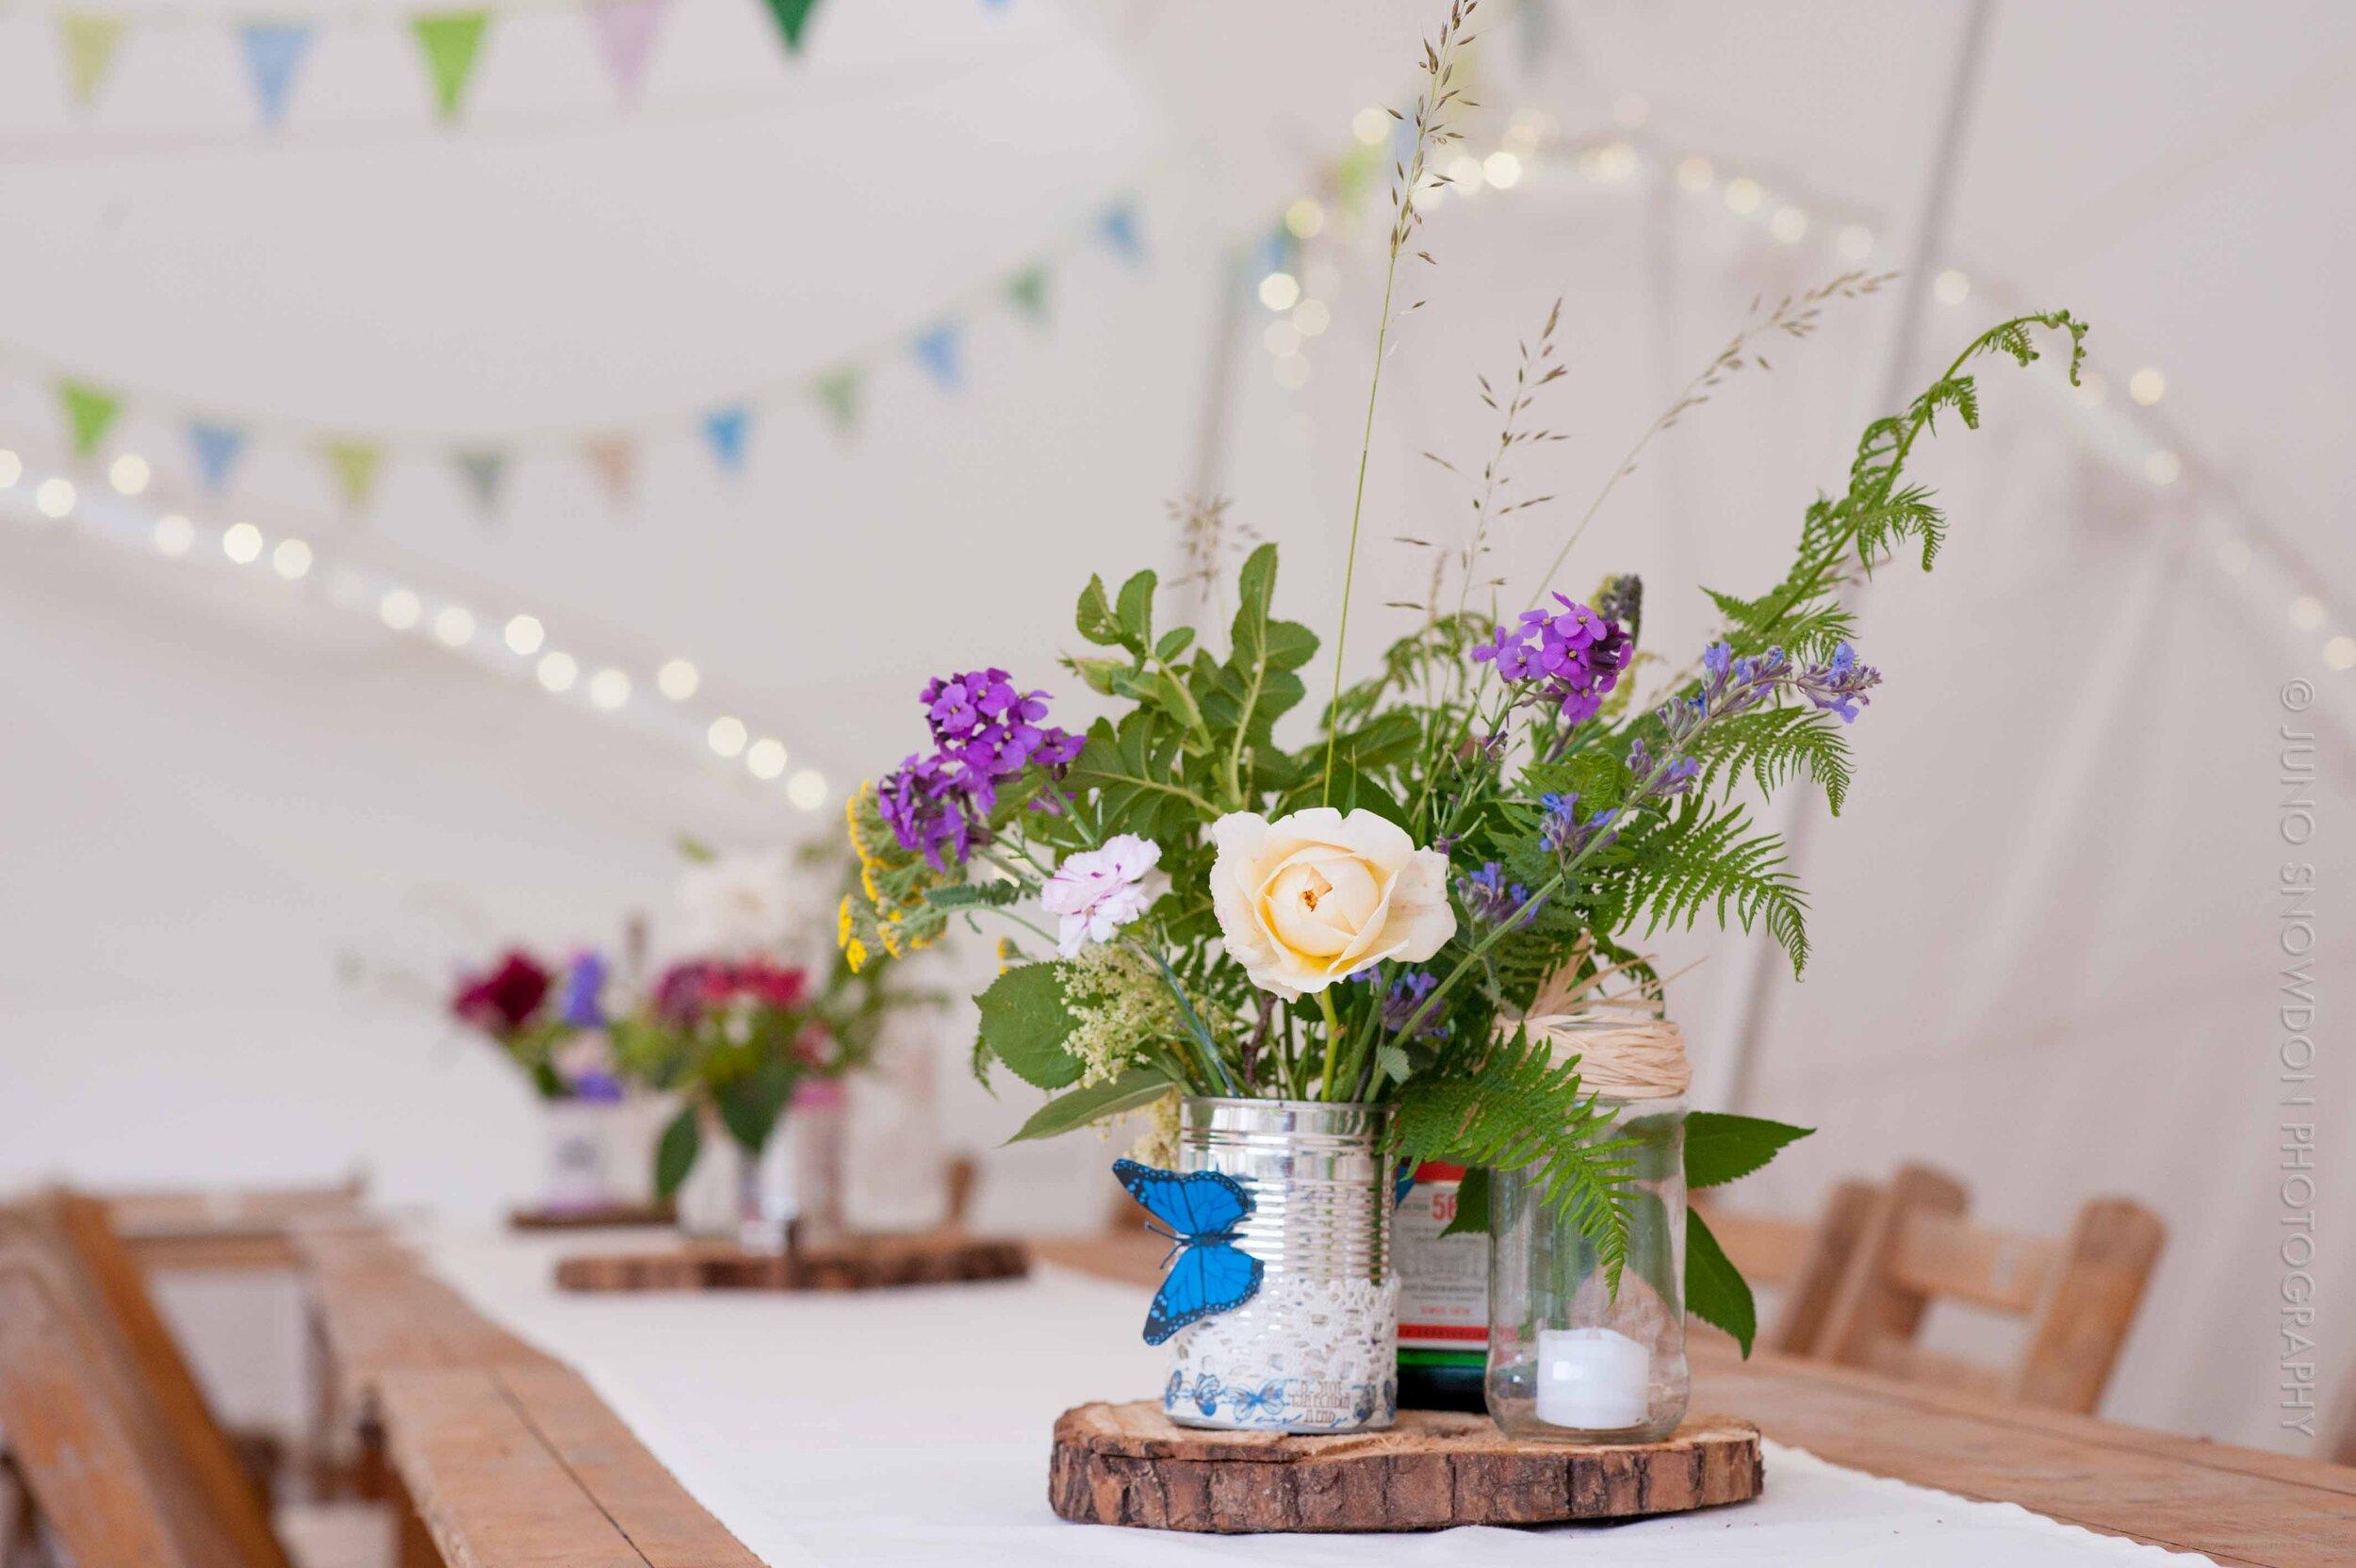 juno-snowdon-photography-wedding-0706.jpg